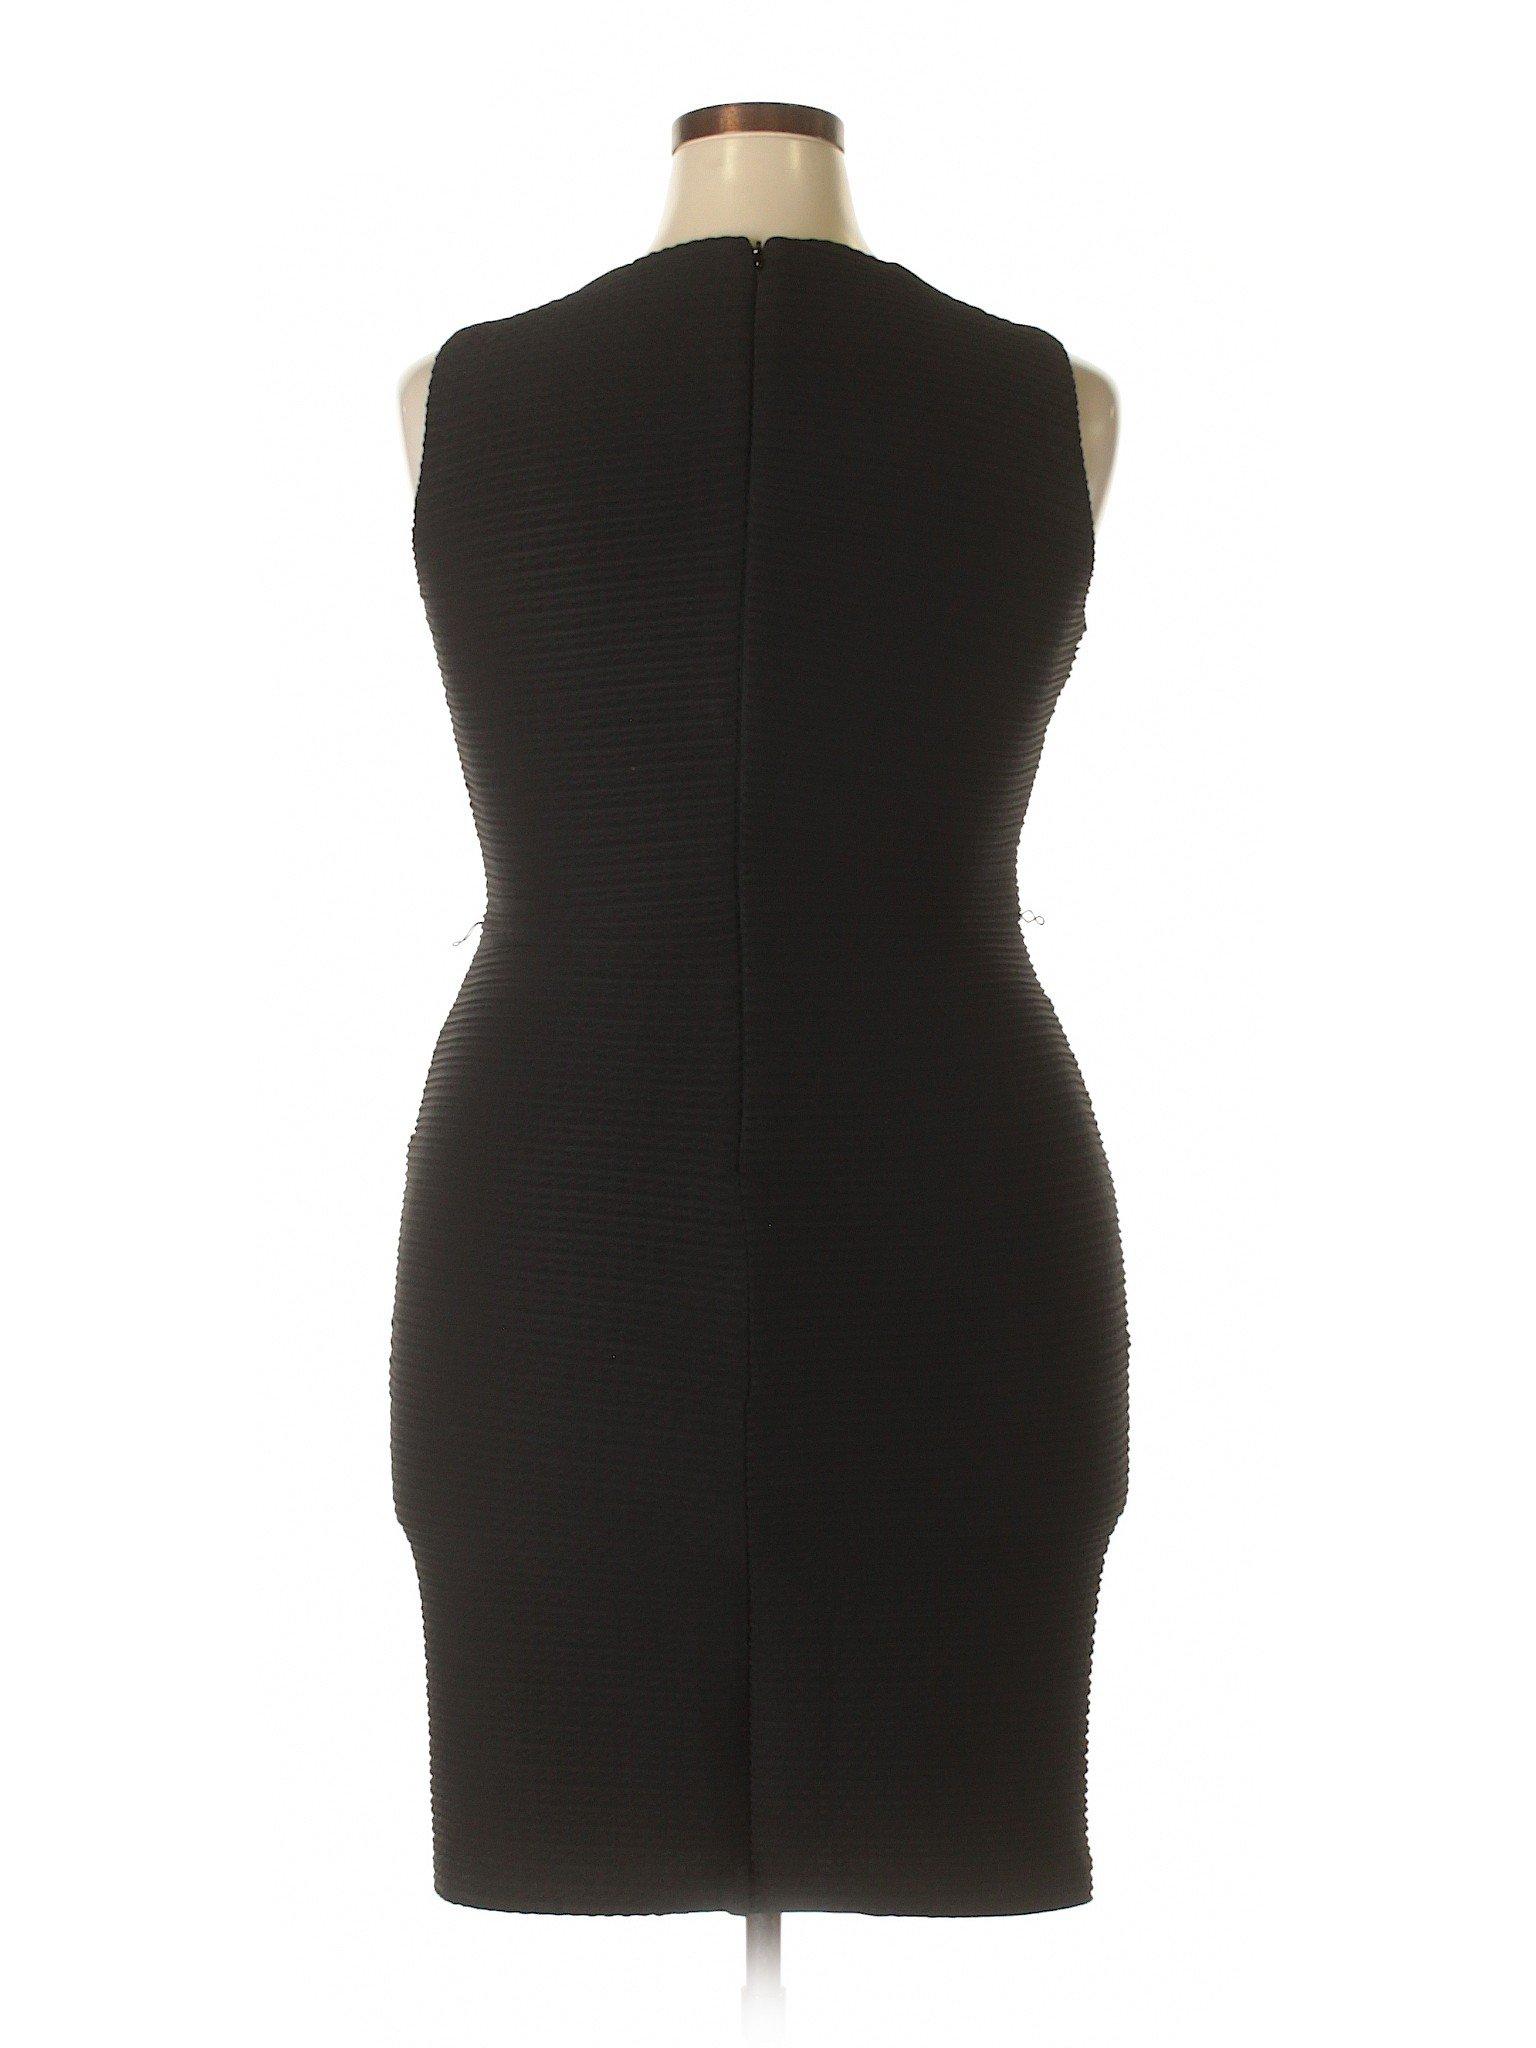 Dress winter Klein Calvin Casual Boutique WpIqzgHW